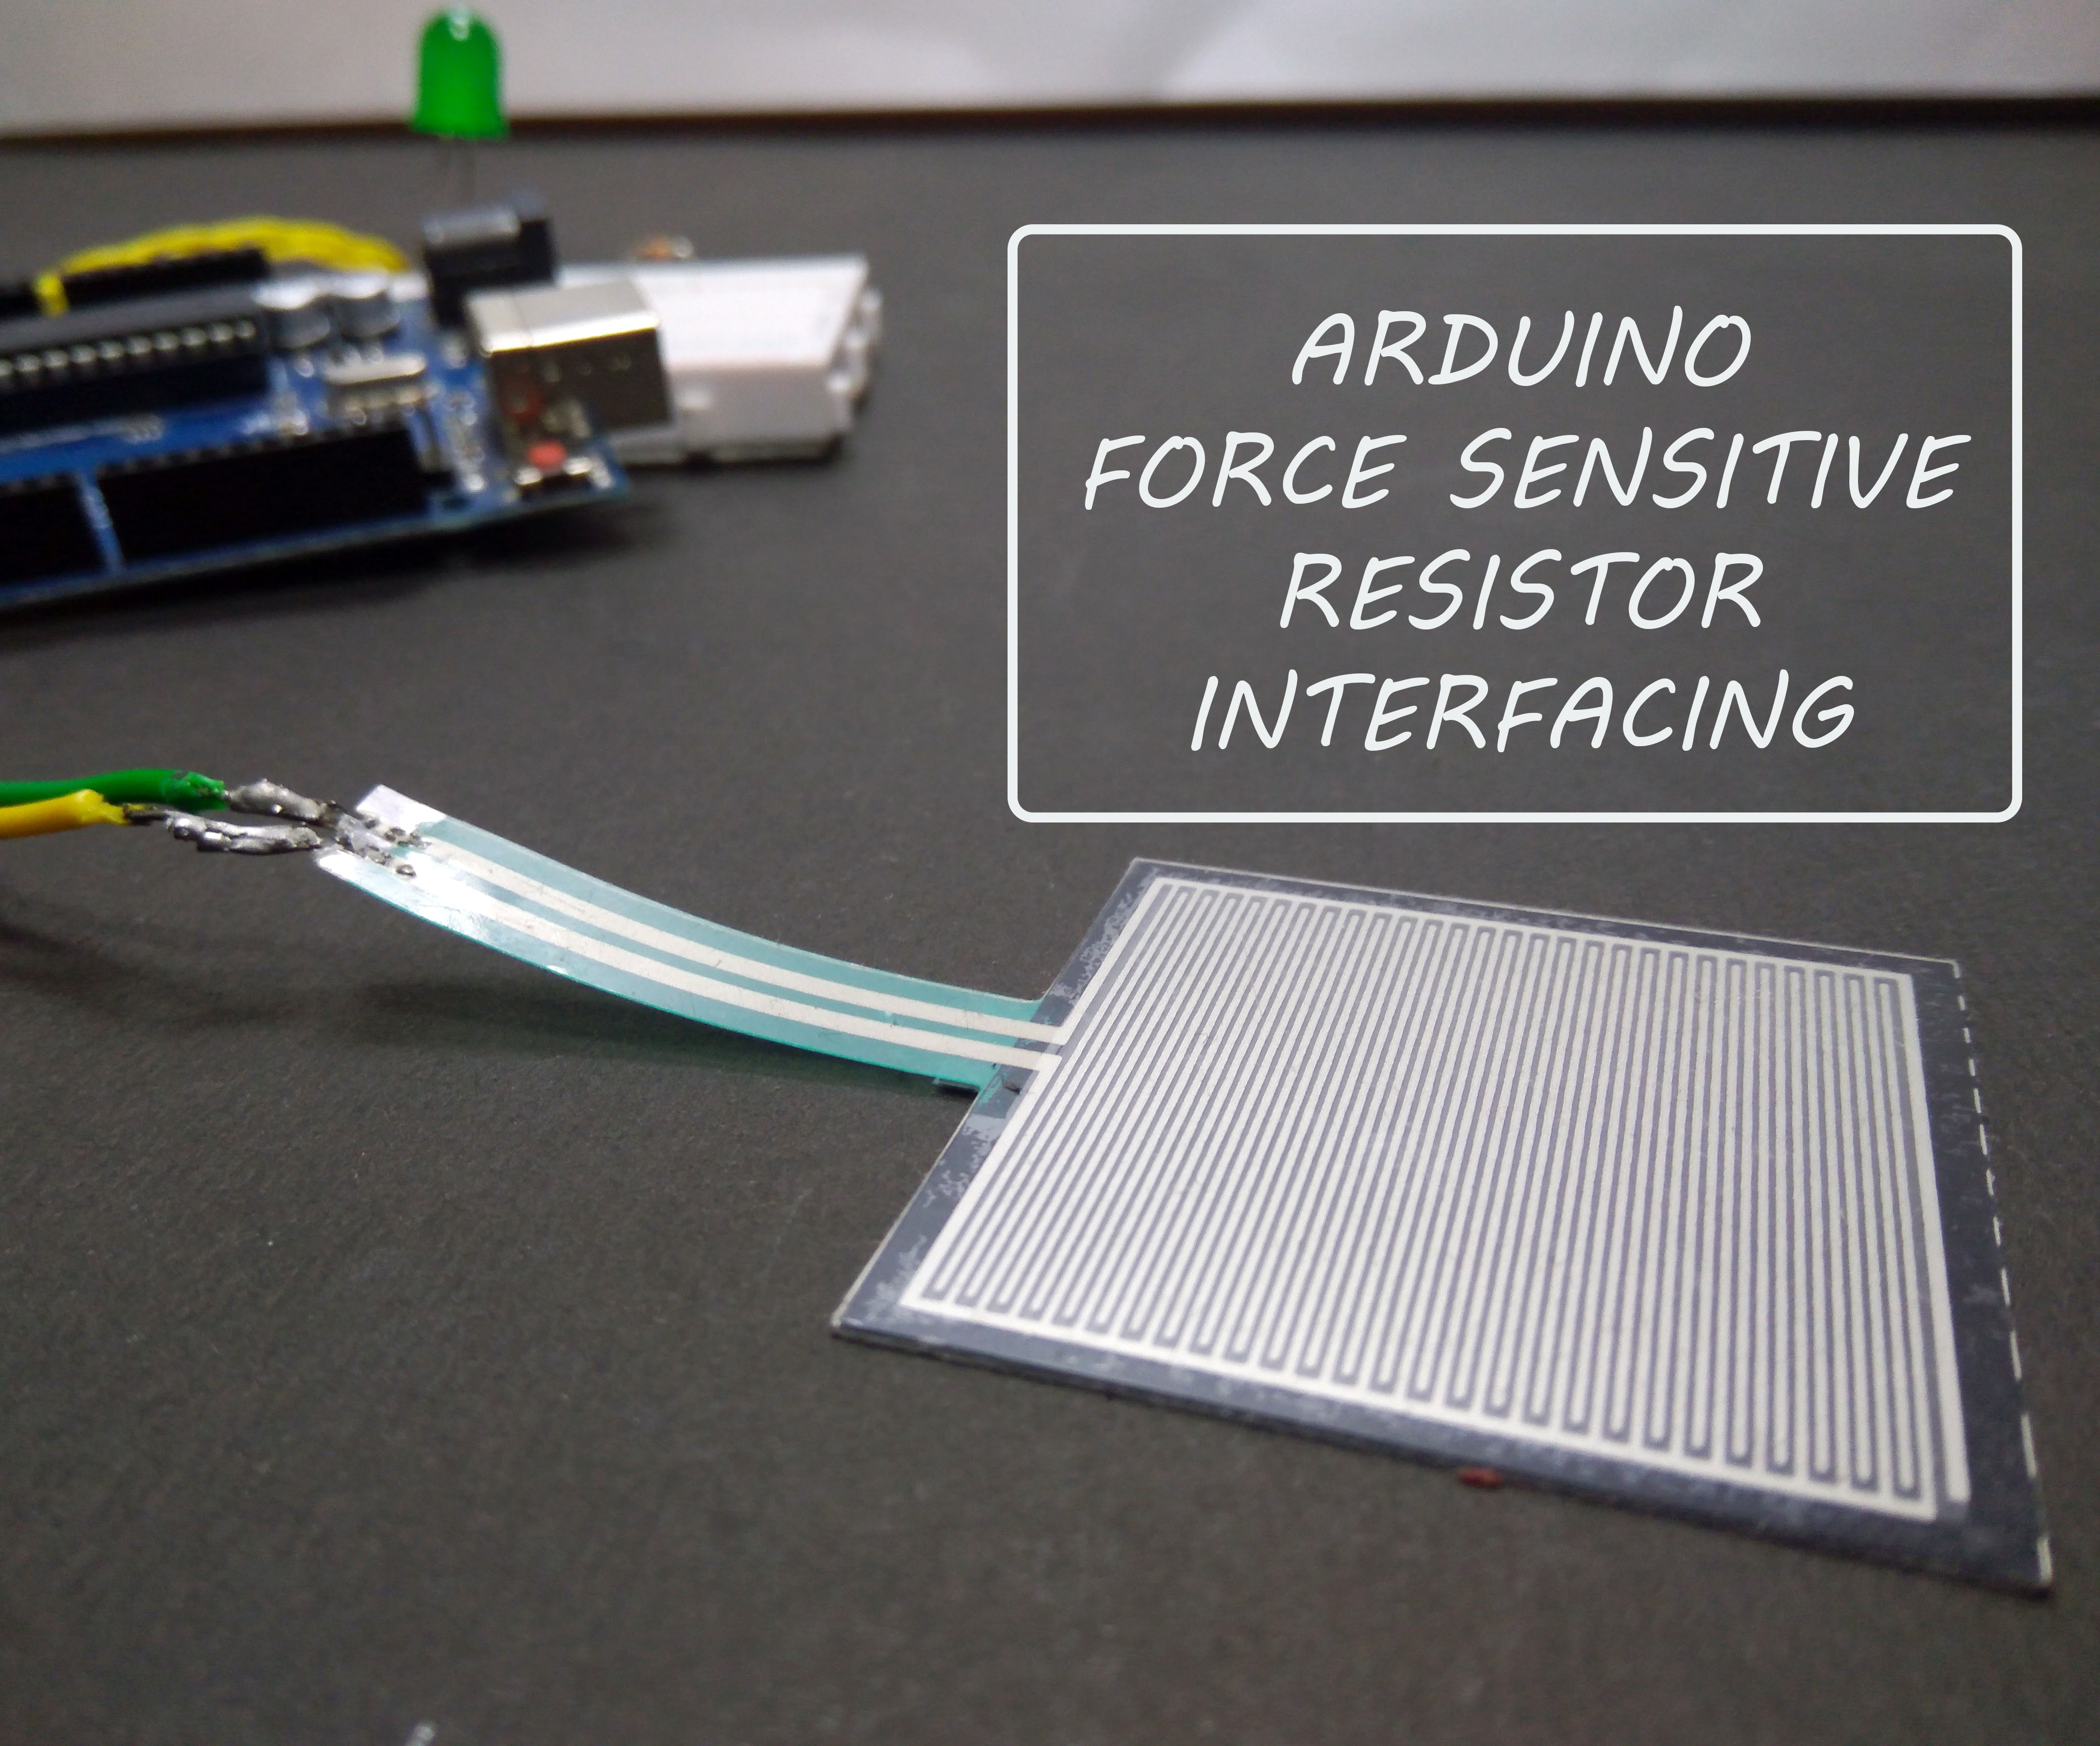 Interfacing Force Sensitive Resistor to Arduino